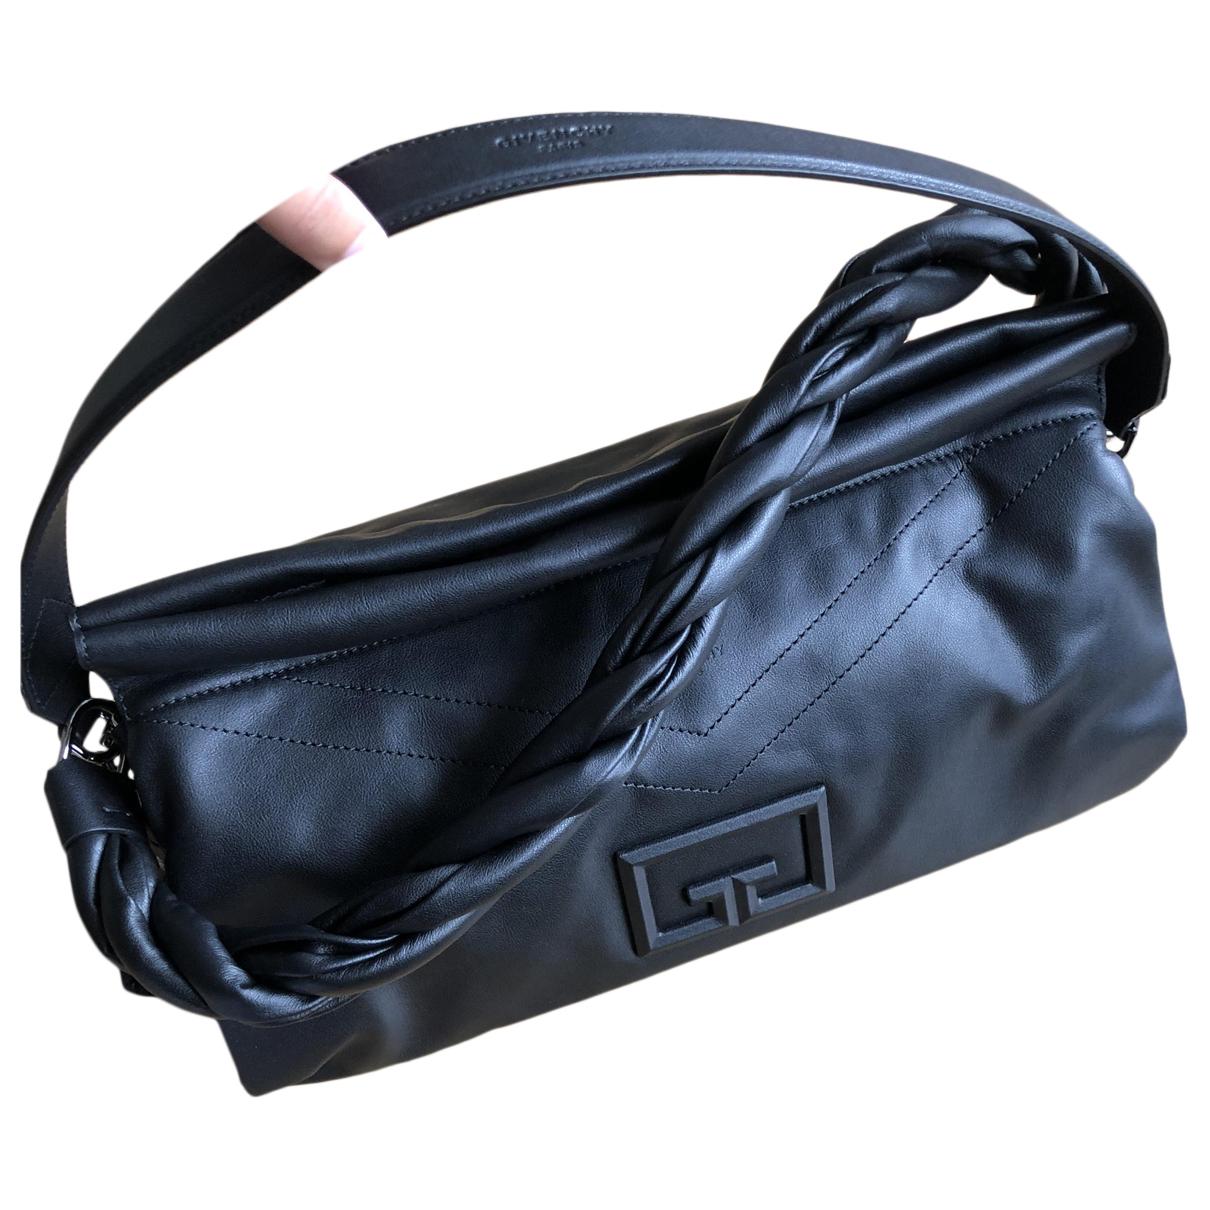 Givenchy N Black Leather handbag for Women N